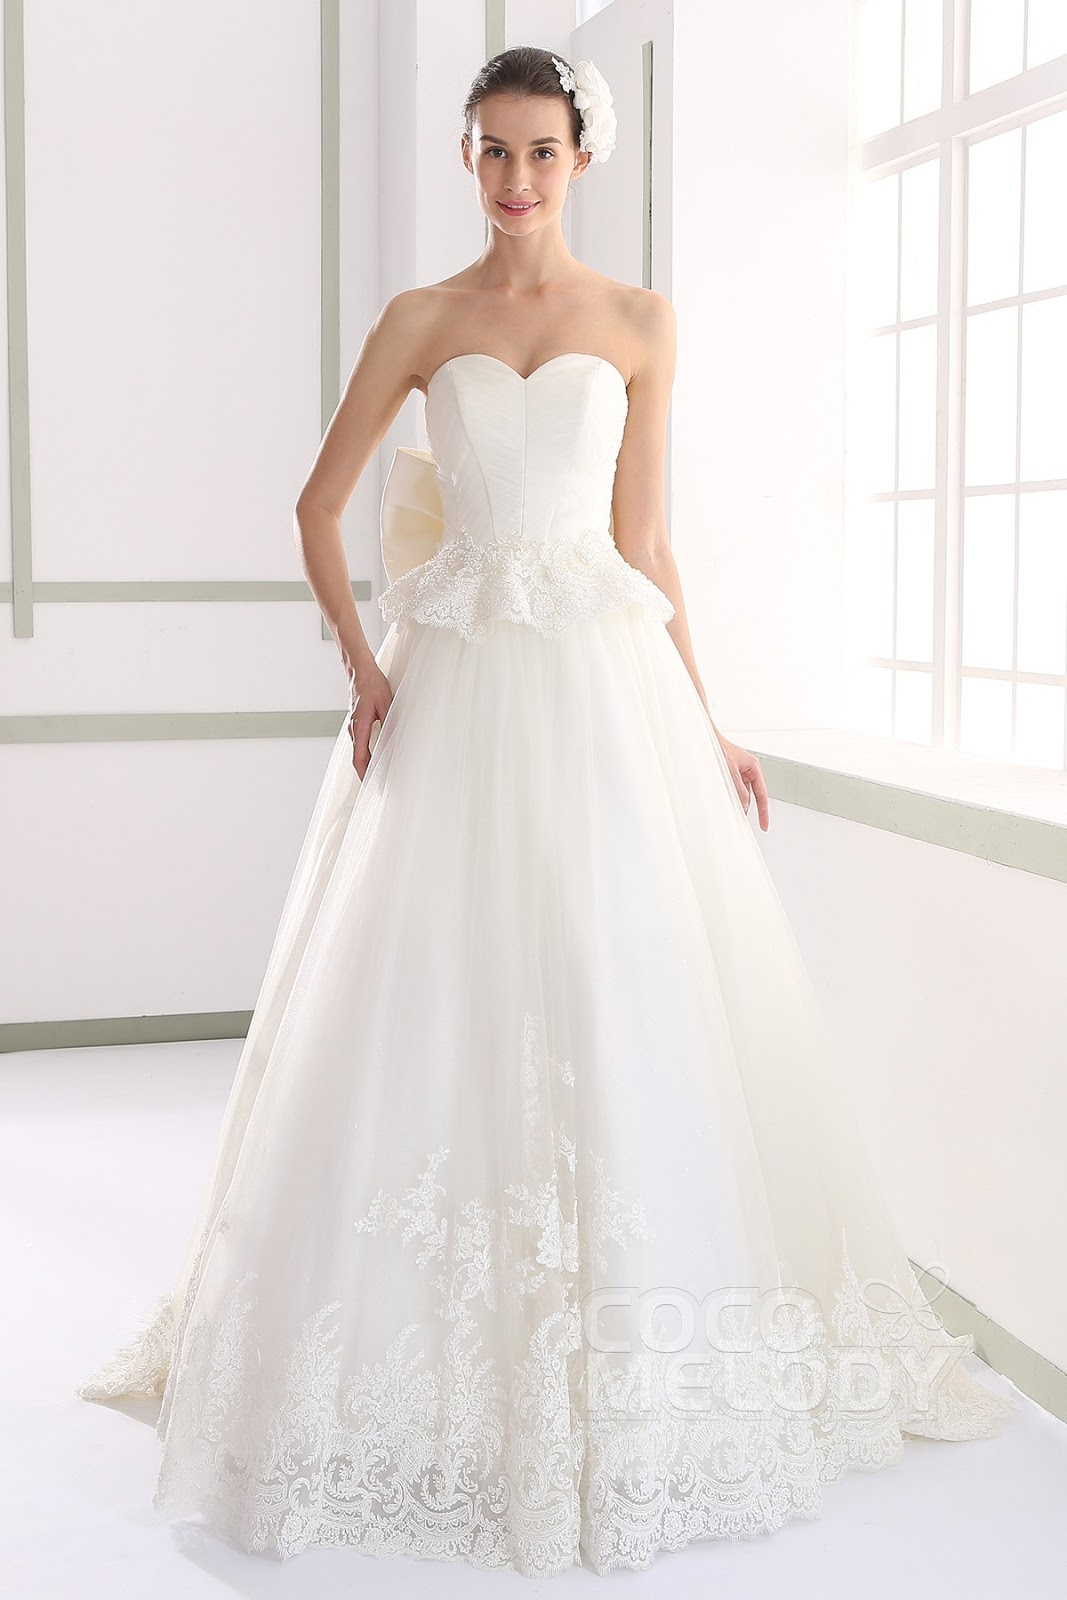 aniia wedding dress: The way to Search for Loving Wedding Dresses?